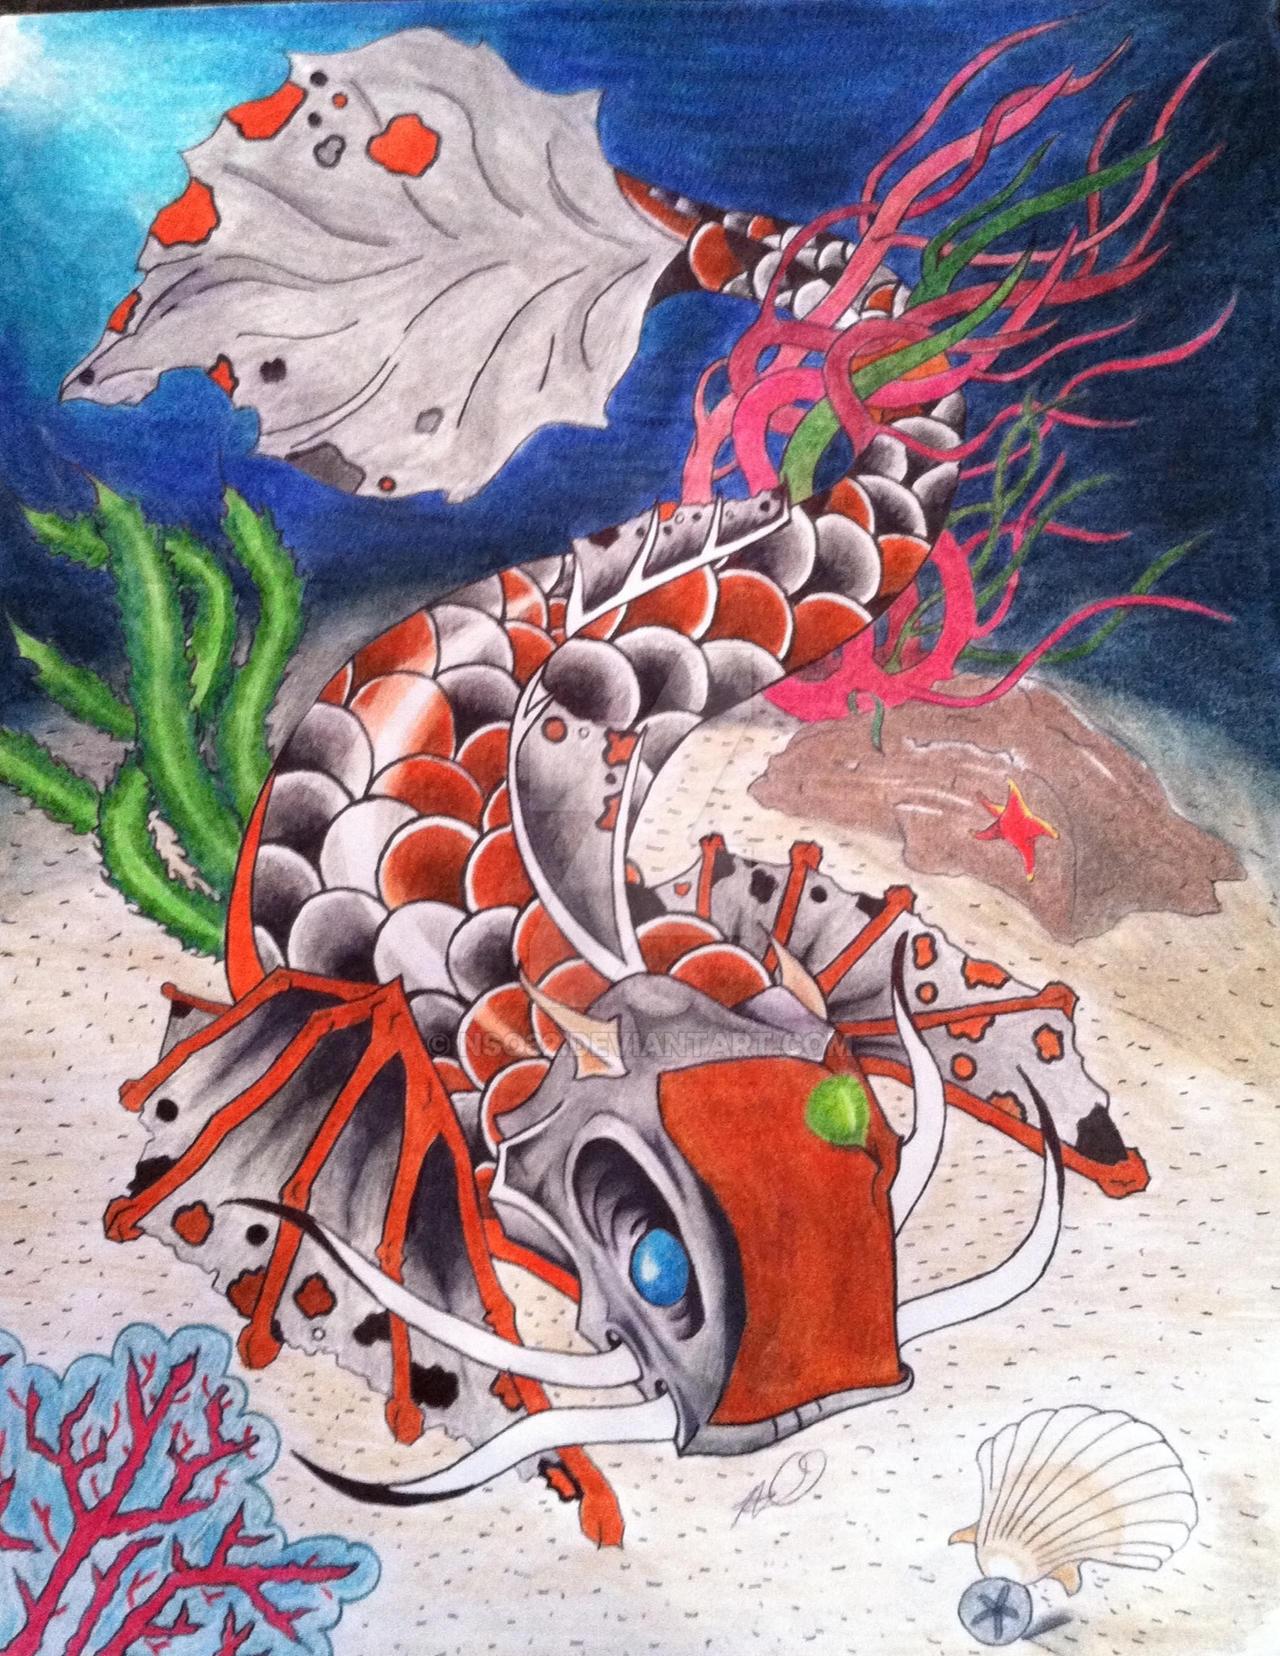 Alien Koi journey to Dragon\'s Gate by Nso32 on DeviantArt